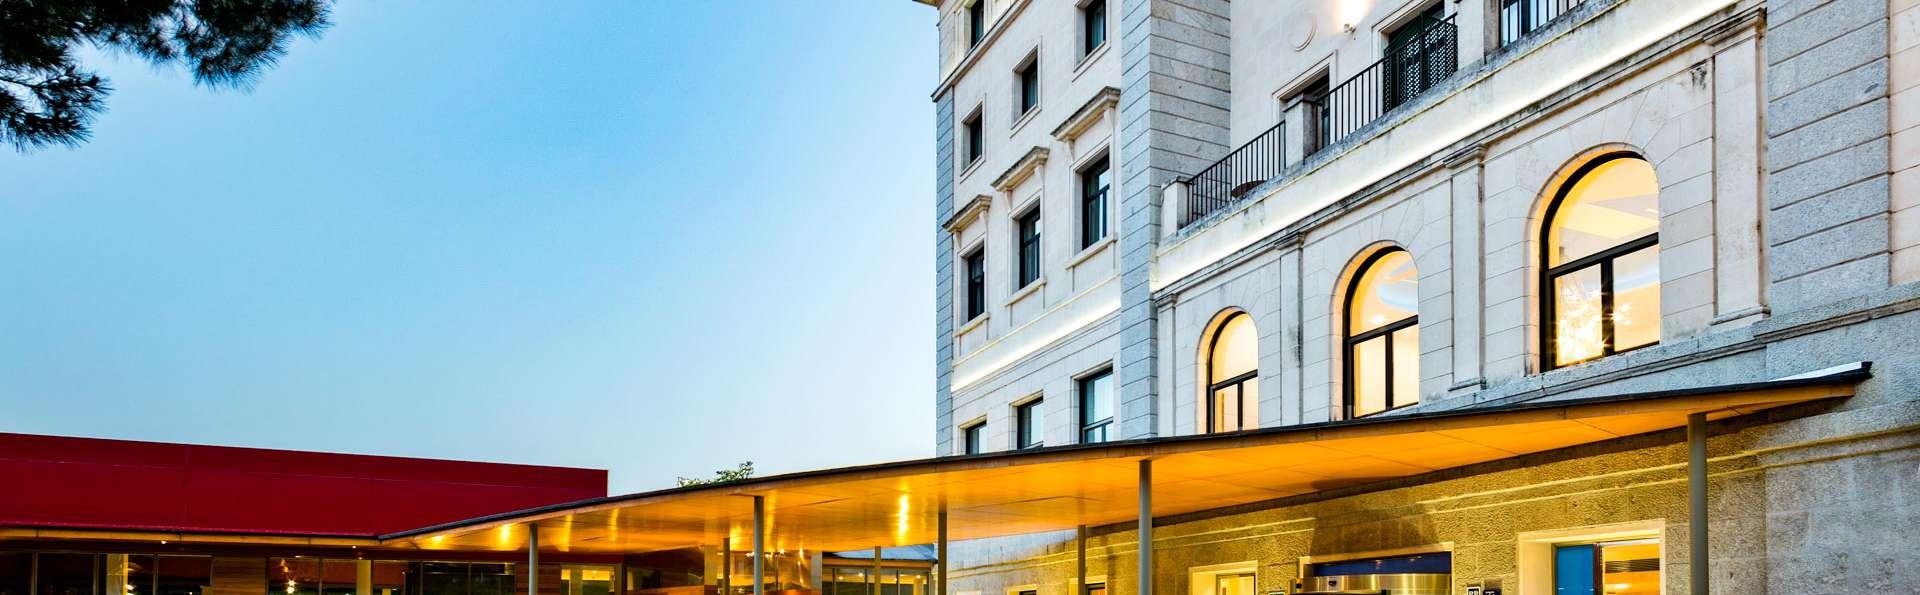 Hotel Abba Burgos - EDIT_FRONT_01.jpg